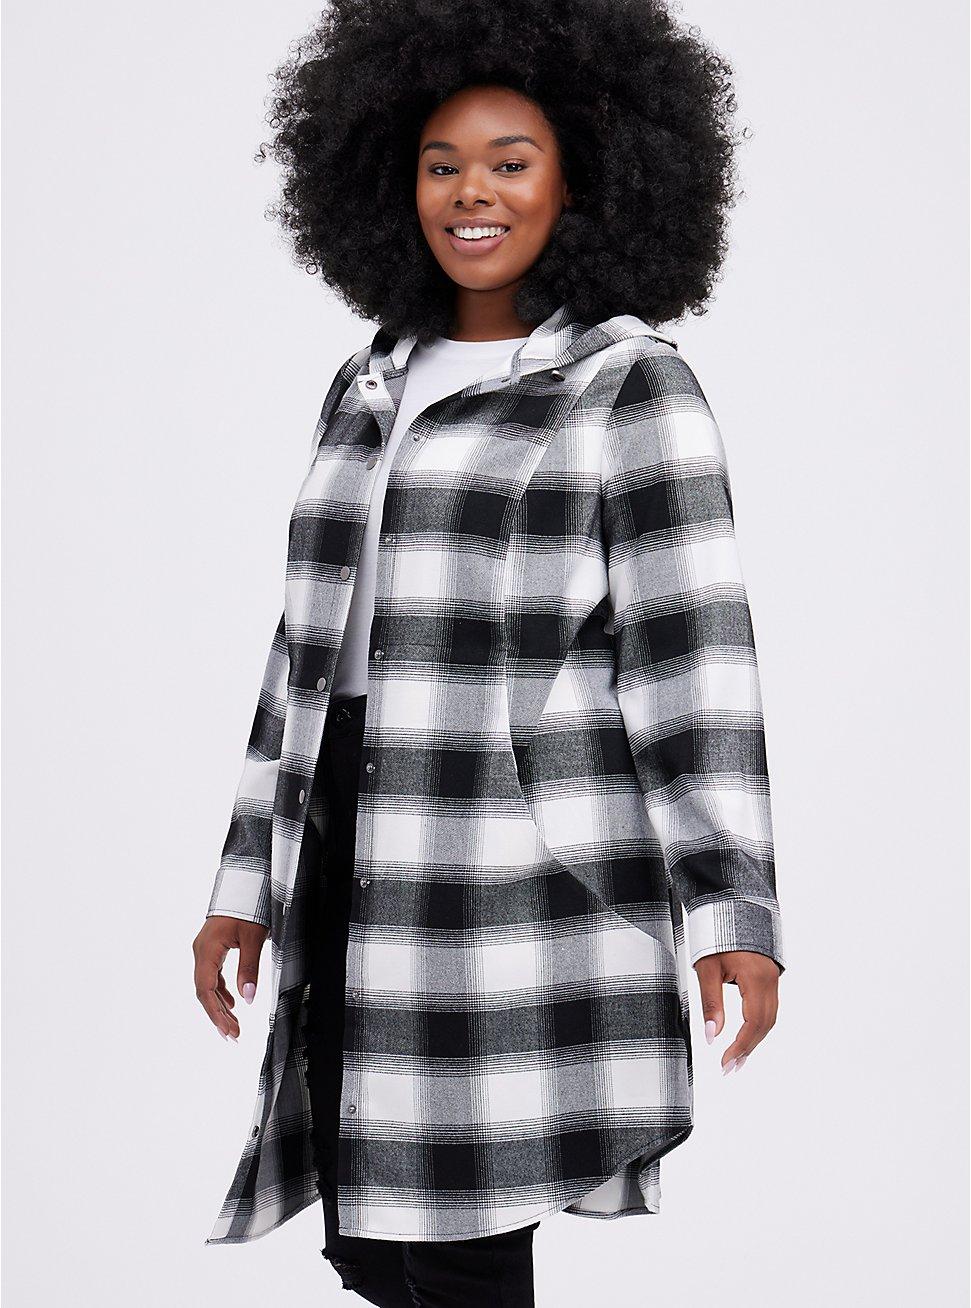 Anorak - Brushed Flannel Plaid Black & White , MULTI, hi-res